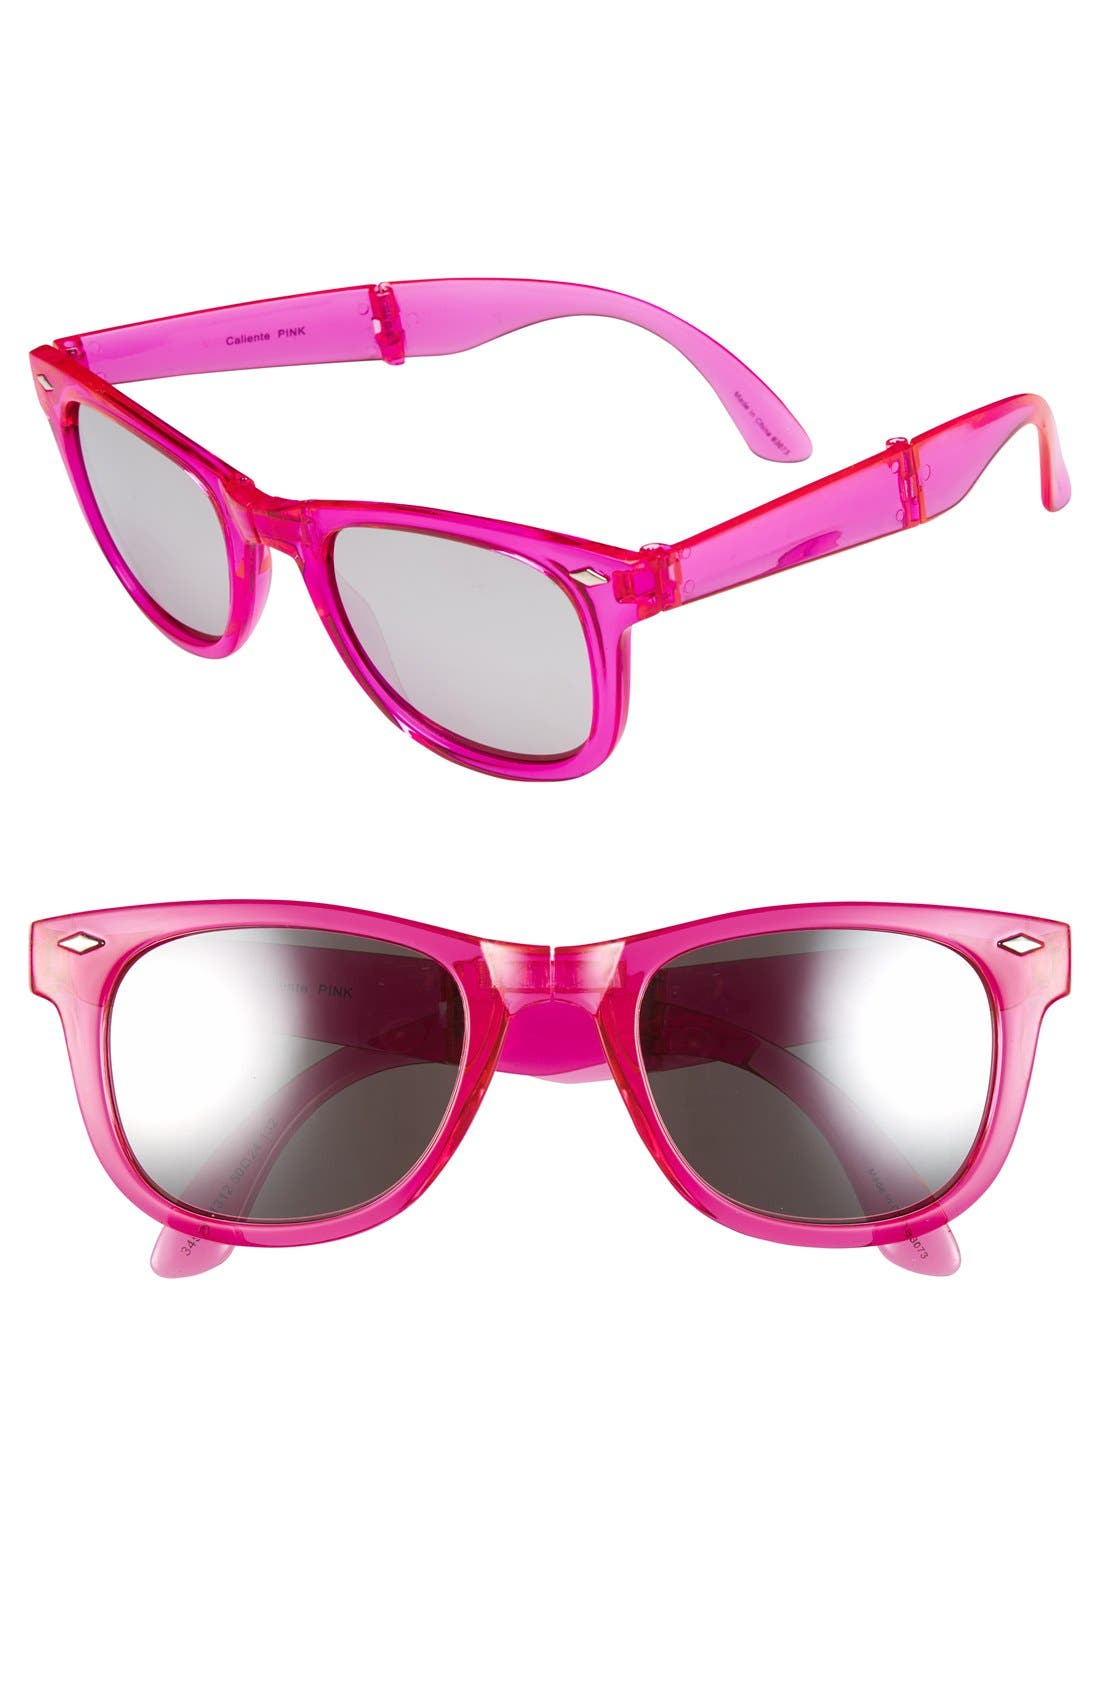 Alternate Image 1 Selected - Outlook Eyewear 'Caliente' 50mm Foldable Sunglasses